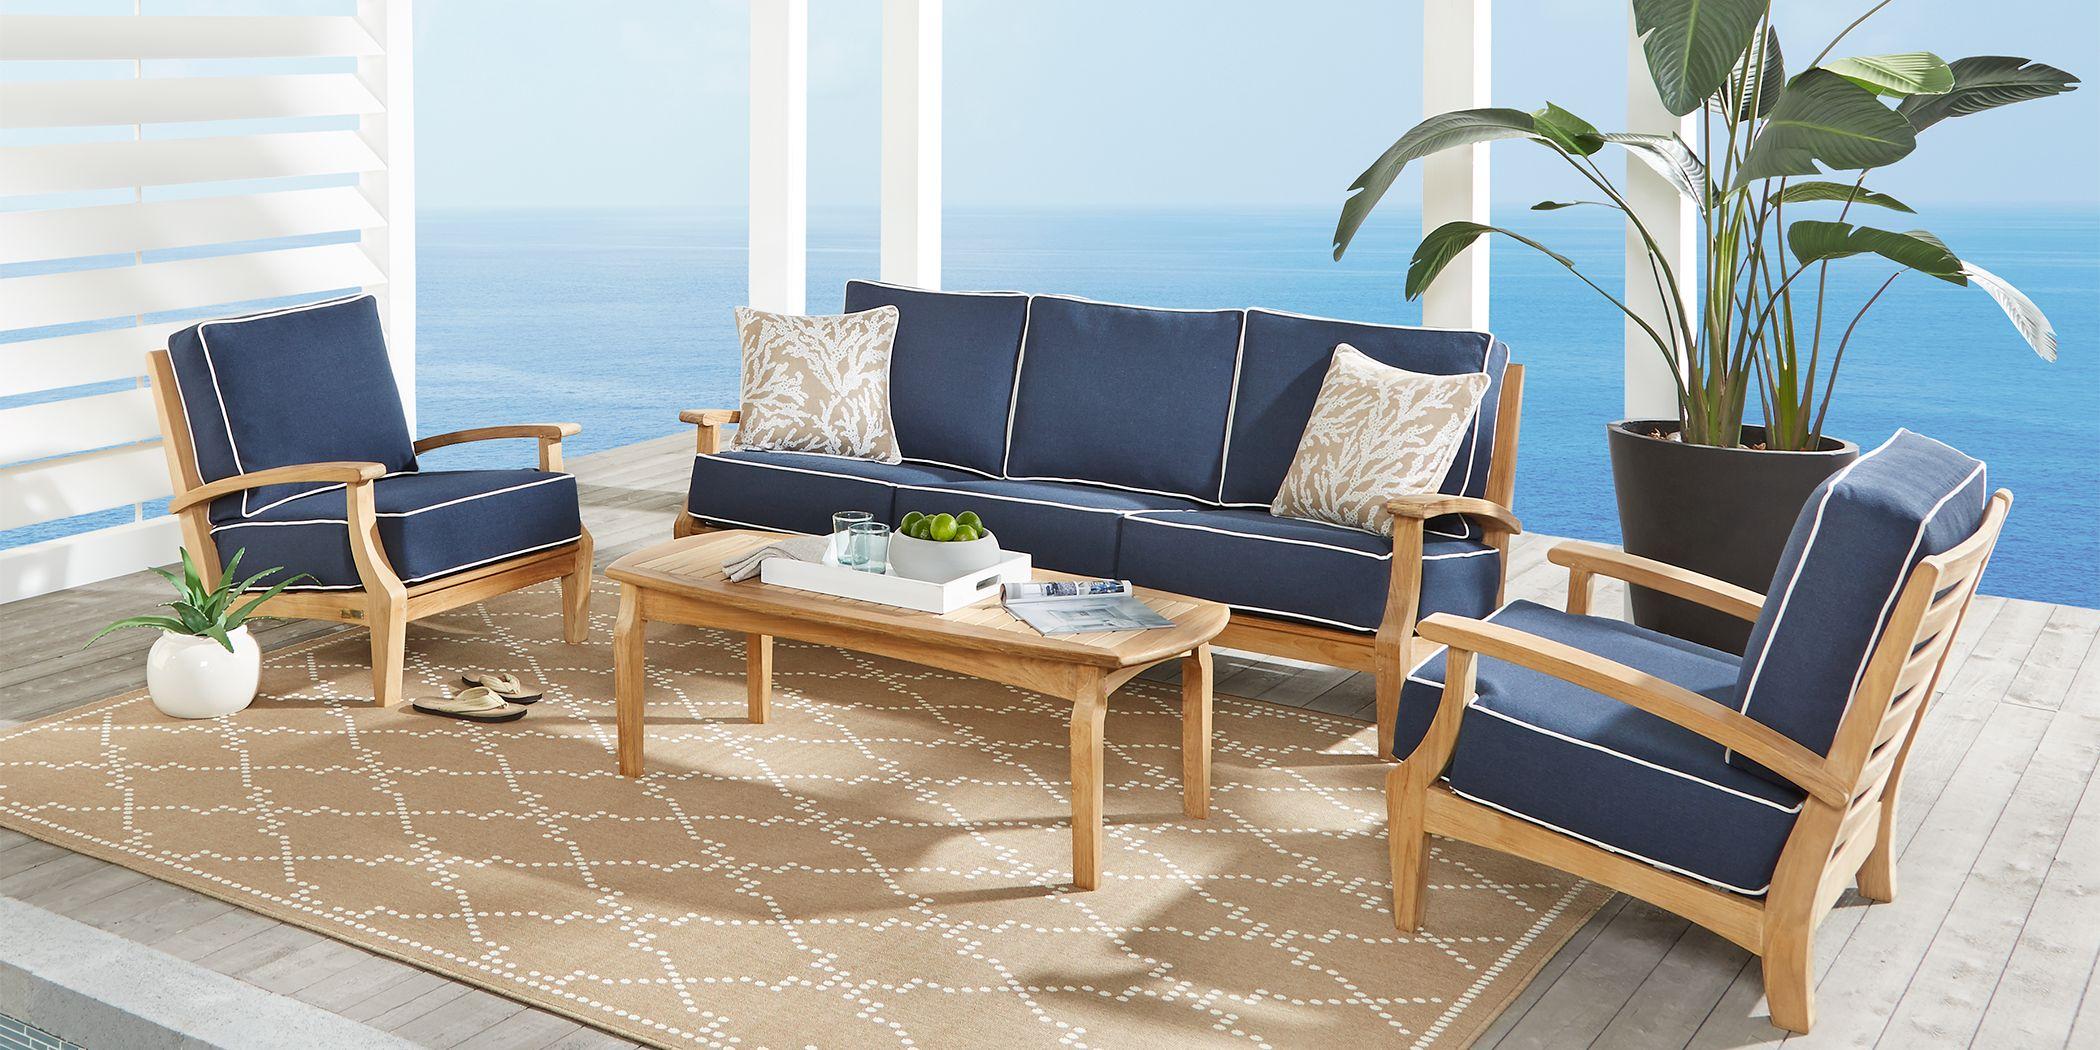 Pleasant Bay Teak Tan 4 Pc Outdoor Seating Set with Denim Cushions